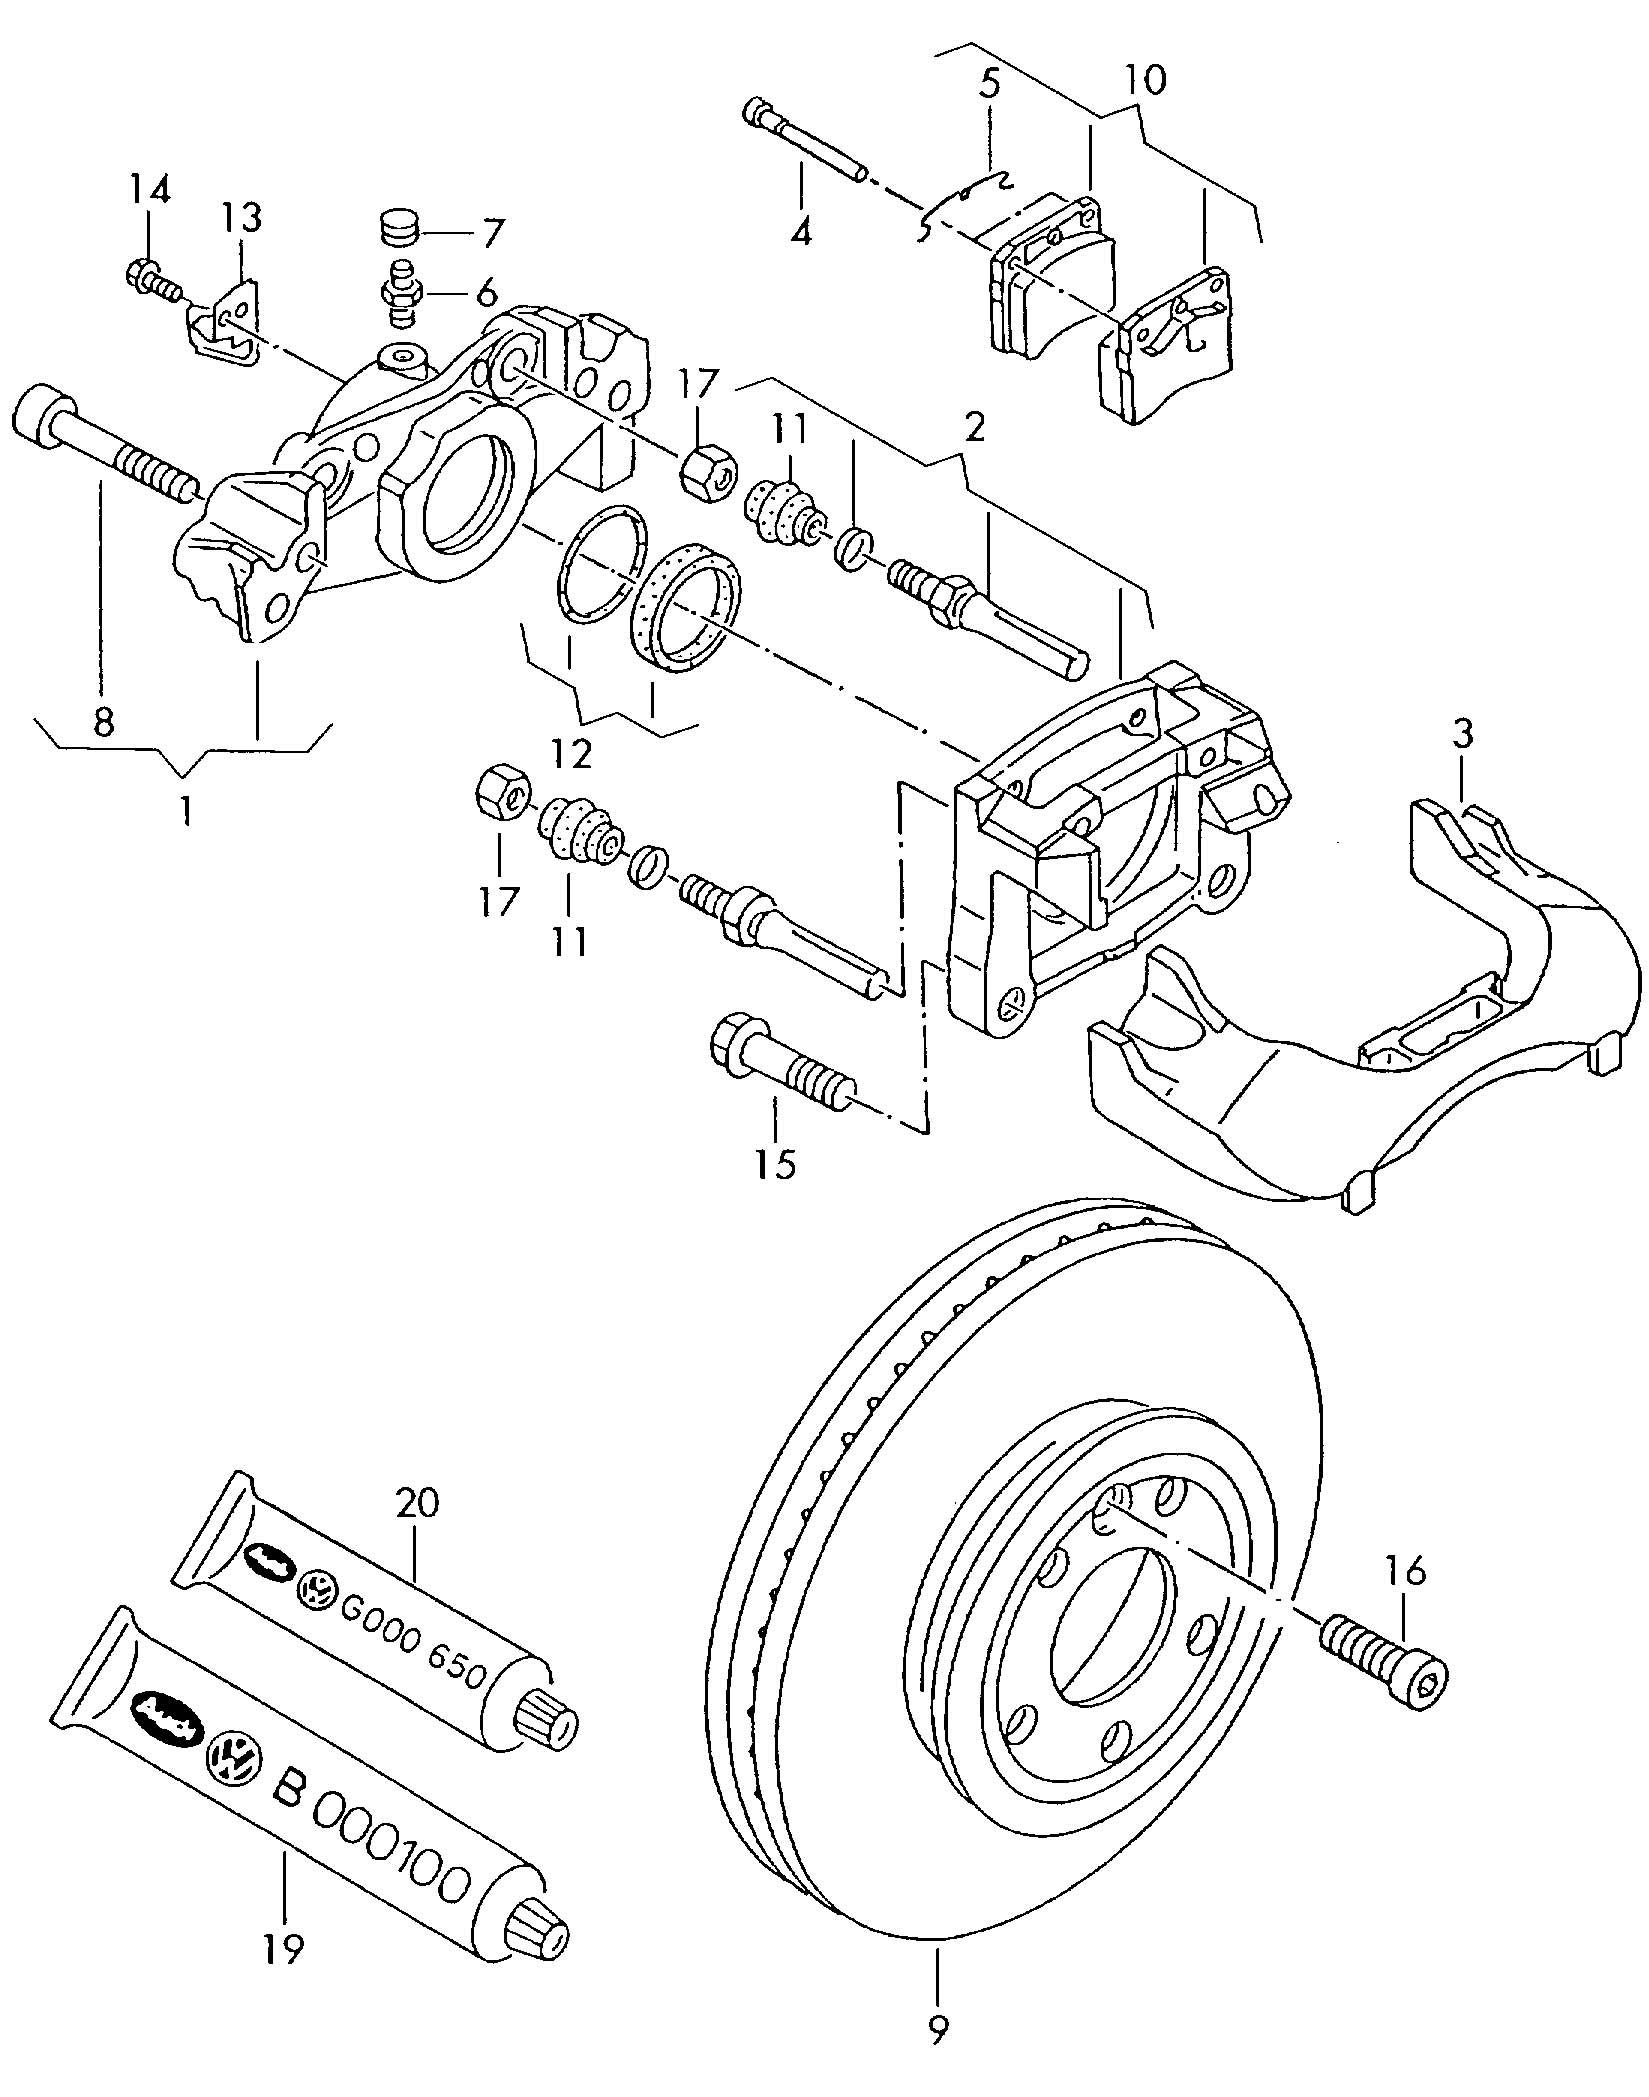 hight resolution of 2012 volkswagen tiguan engine diagram 2012 volkswagen tiguan review engine coolant light volkswagen tiguan wiring diagrams